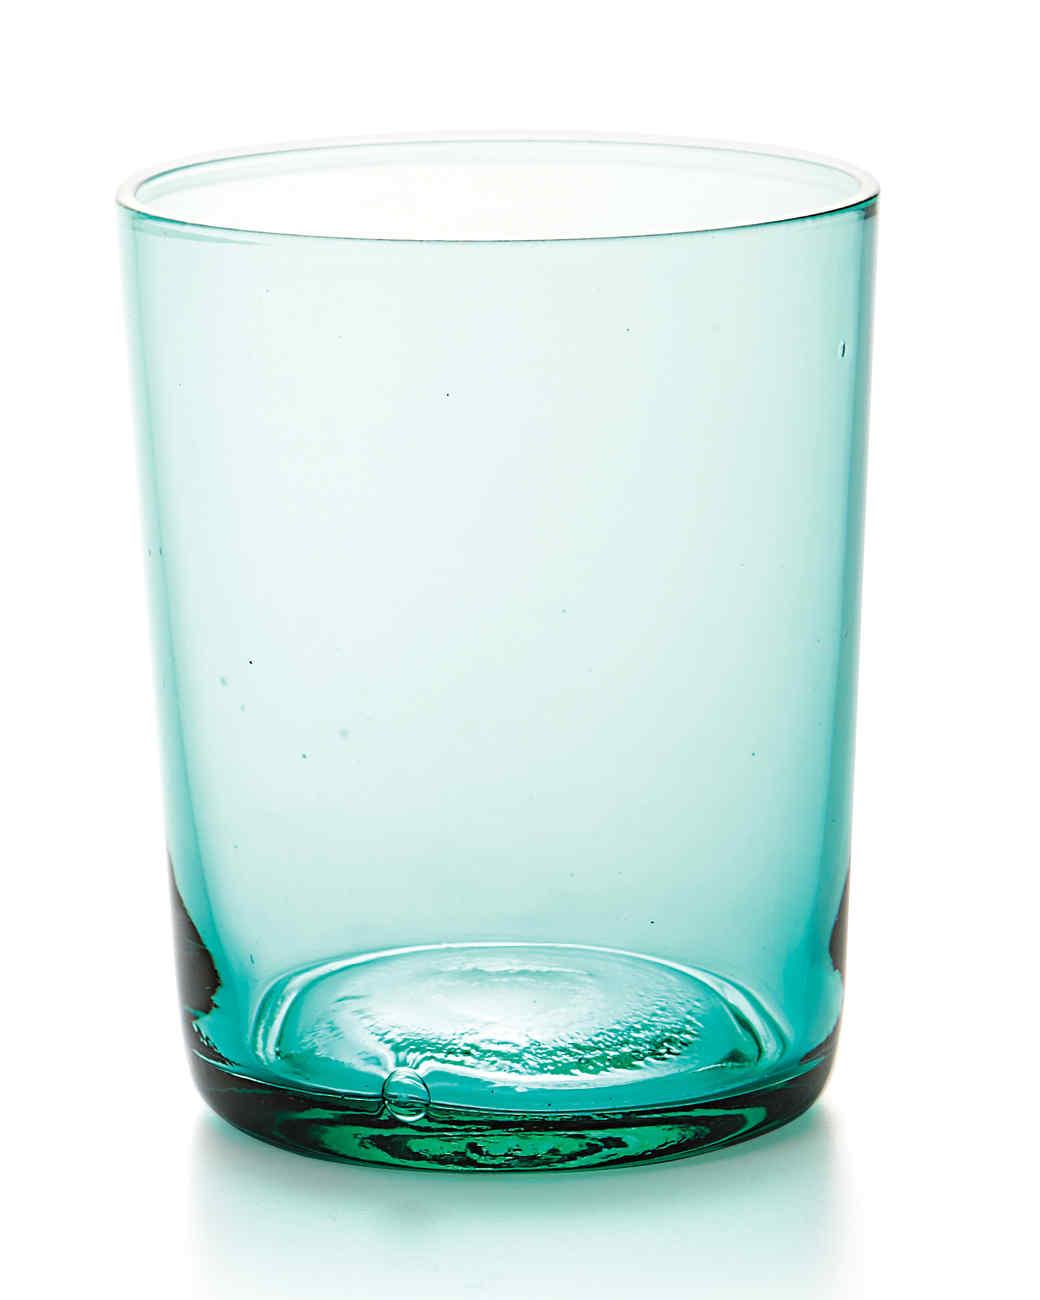 glass-057-mld110044.jpg